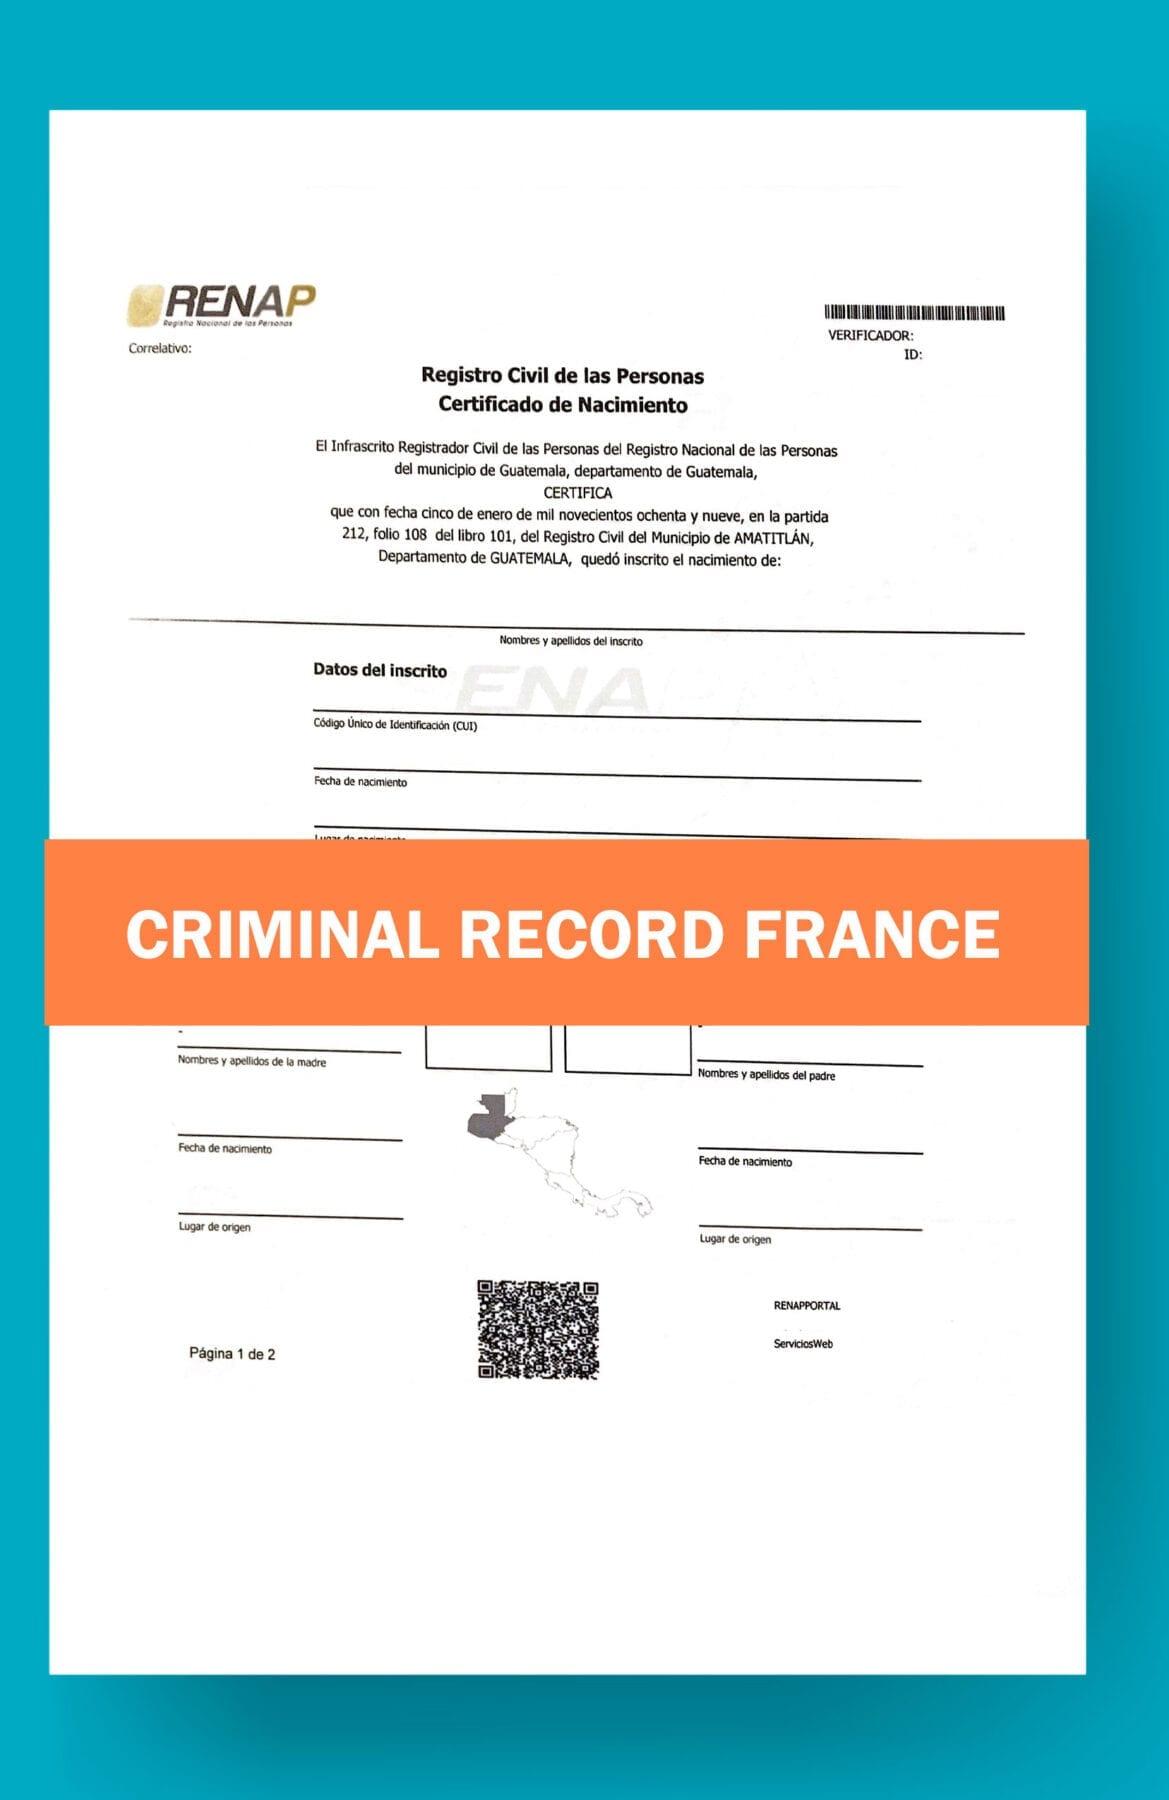 CRIMINAL-RECORD-FRANCE